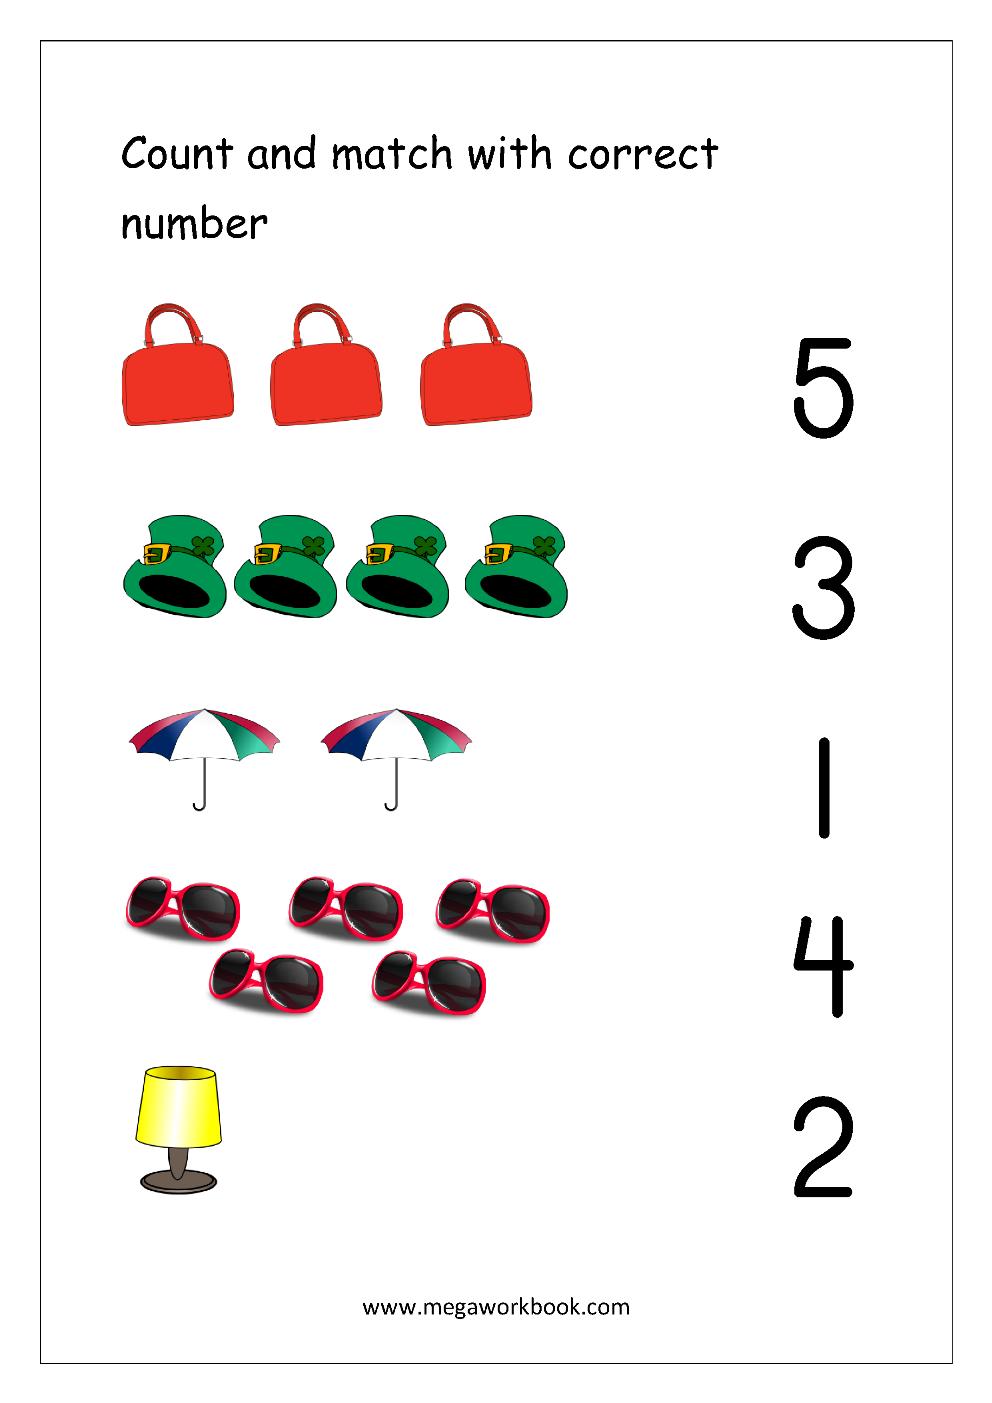 Free Math Worksheets Number Matching Megaworkbook Basic Math Worksheets Free Math Worksheets Learning Worksheets